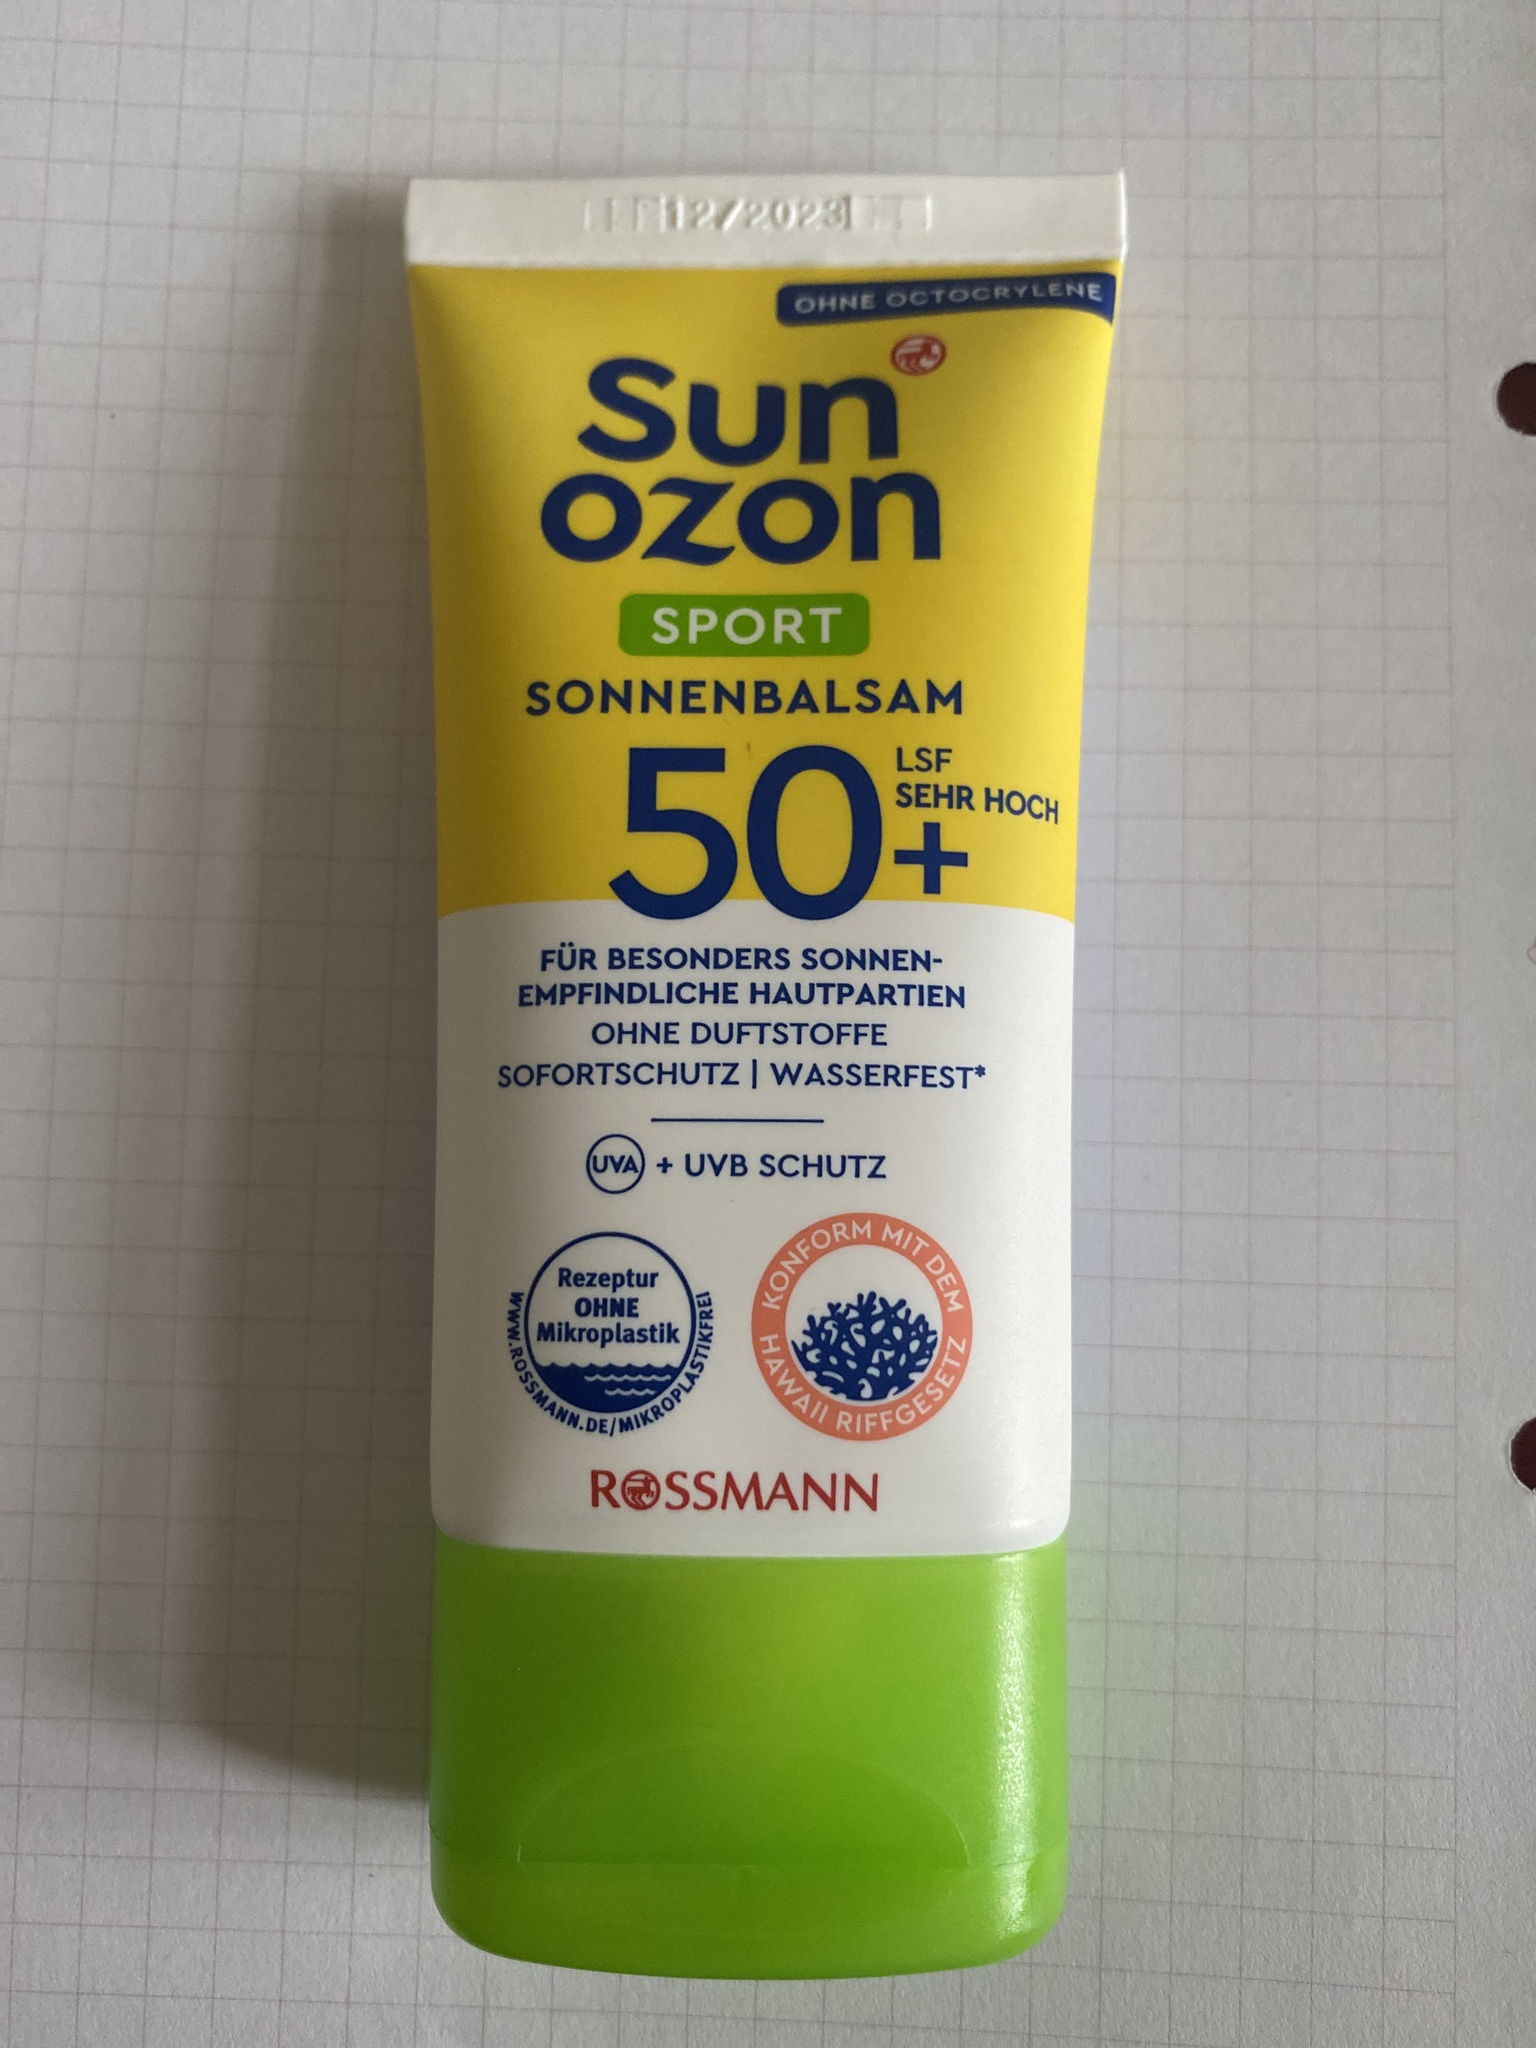 Rossmann Sun Ozon Sport Sonnenbalsam 50+ Lsd Sehr Hoch / Ohne Octocrylene